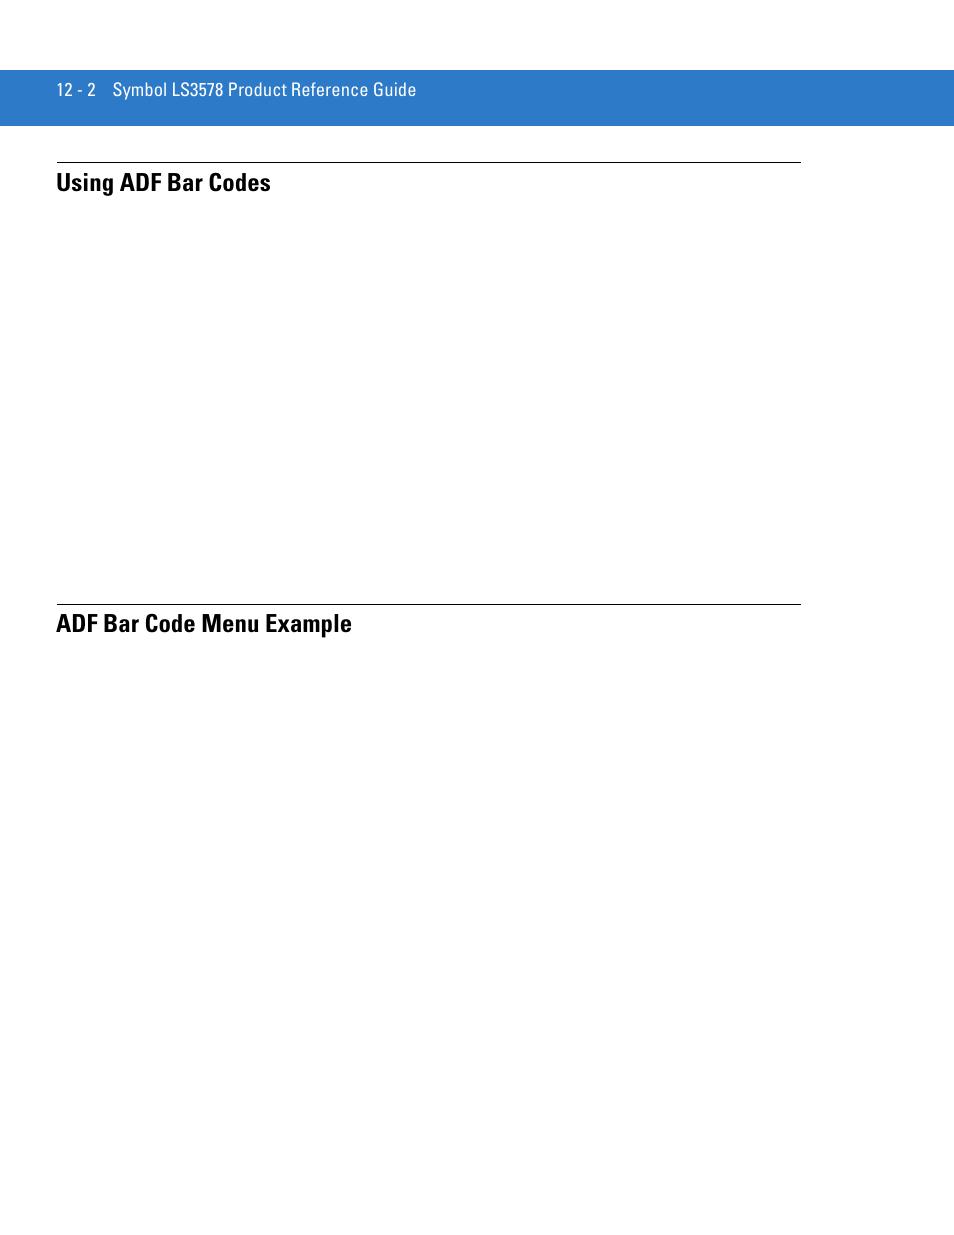 Using Adf Bar Codes Adf Bar Code Menu Example Motorola Ls3578